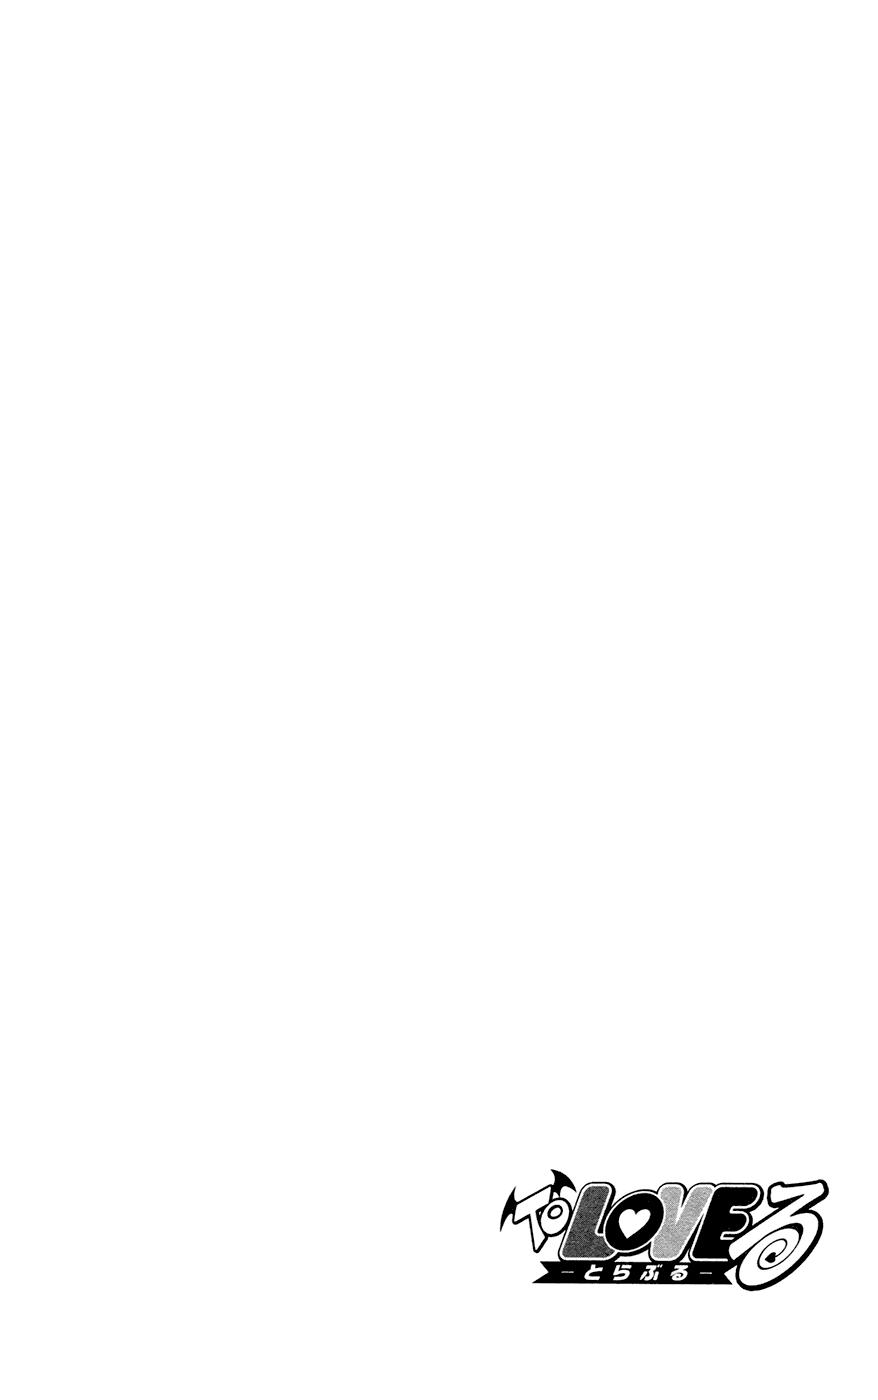 Манга Любовные неприятности / To Love-Ru  - Том 13 Глава 110 Страница 20